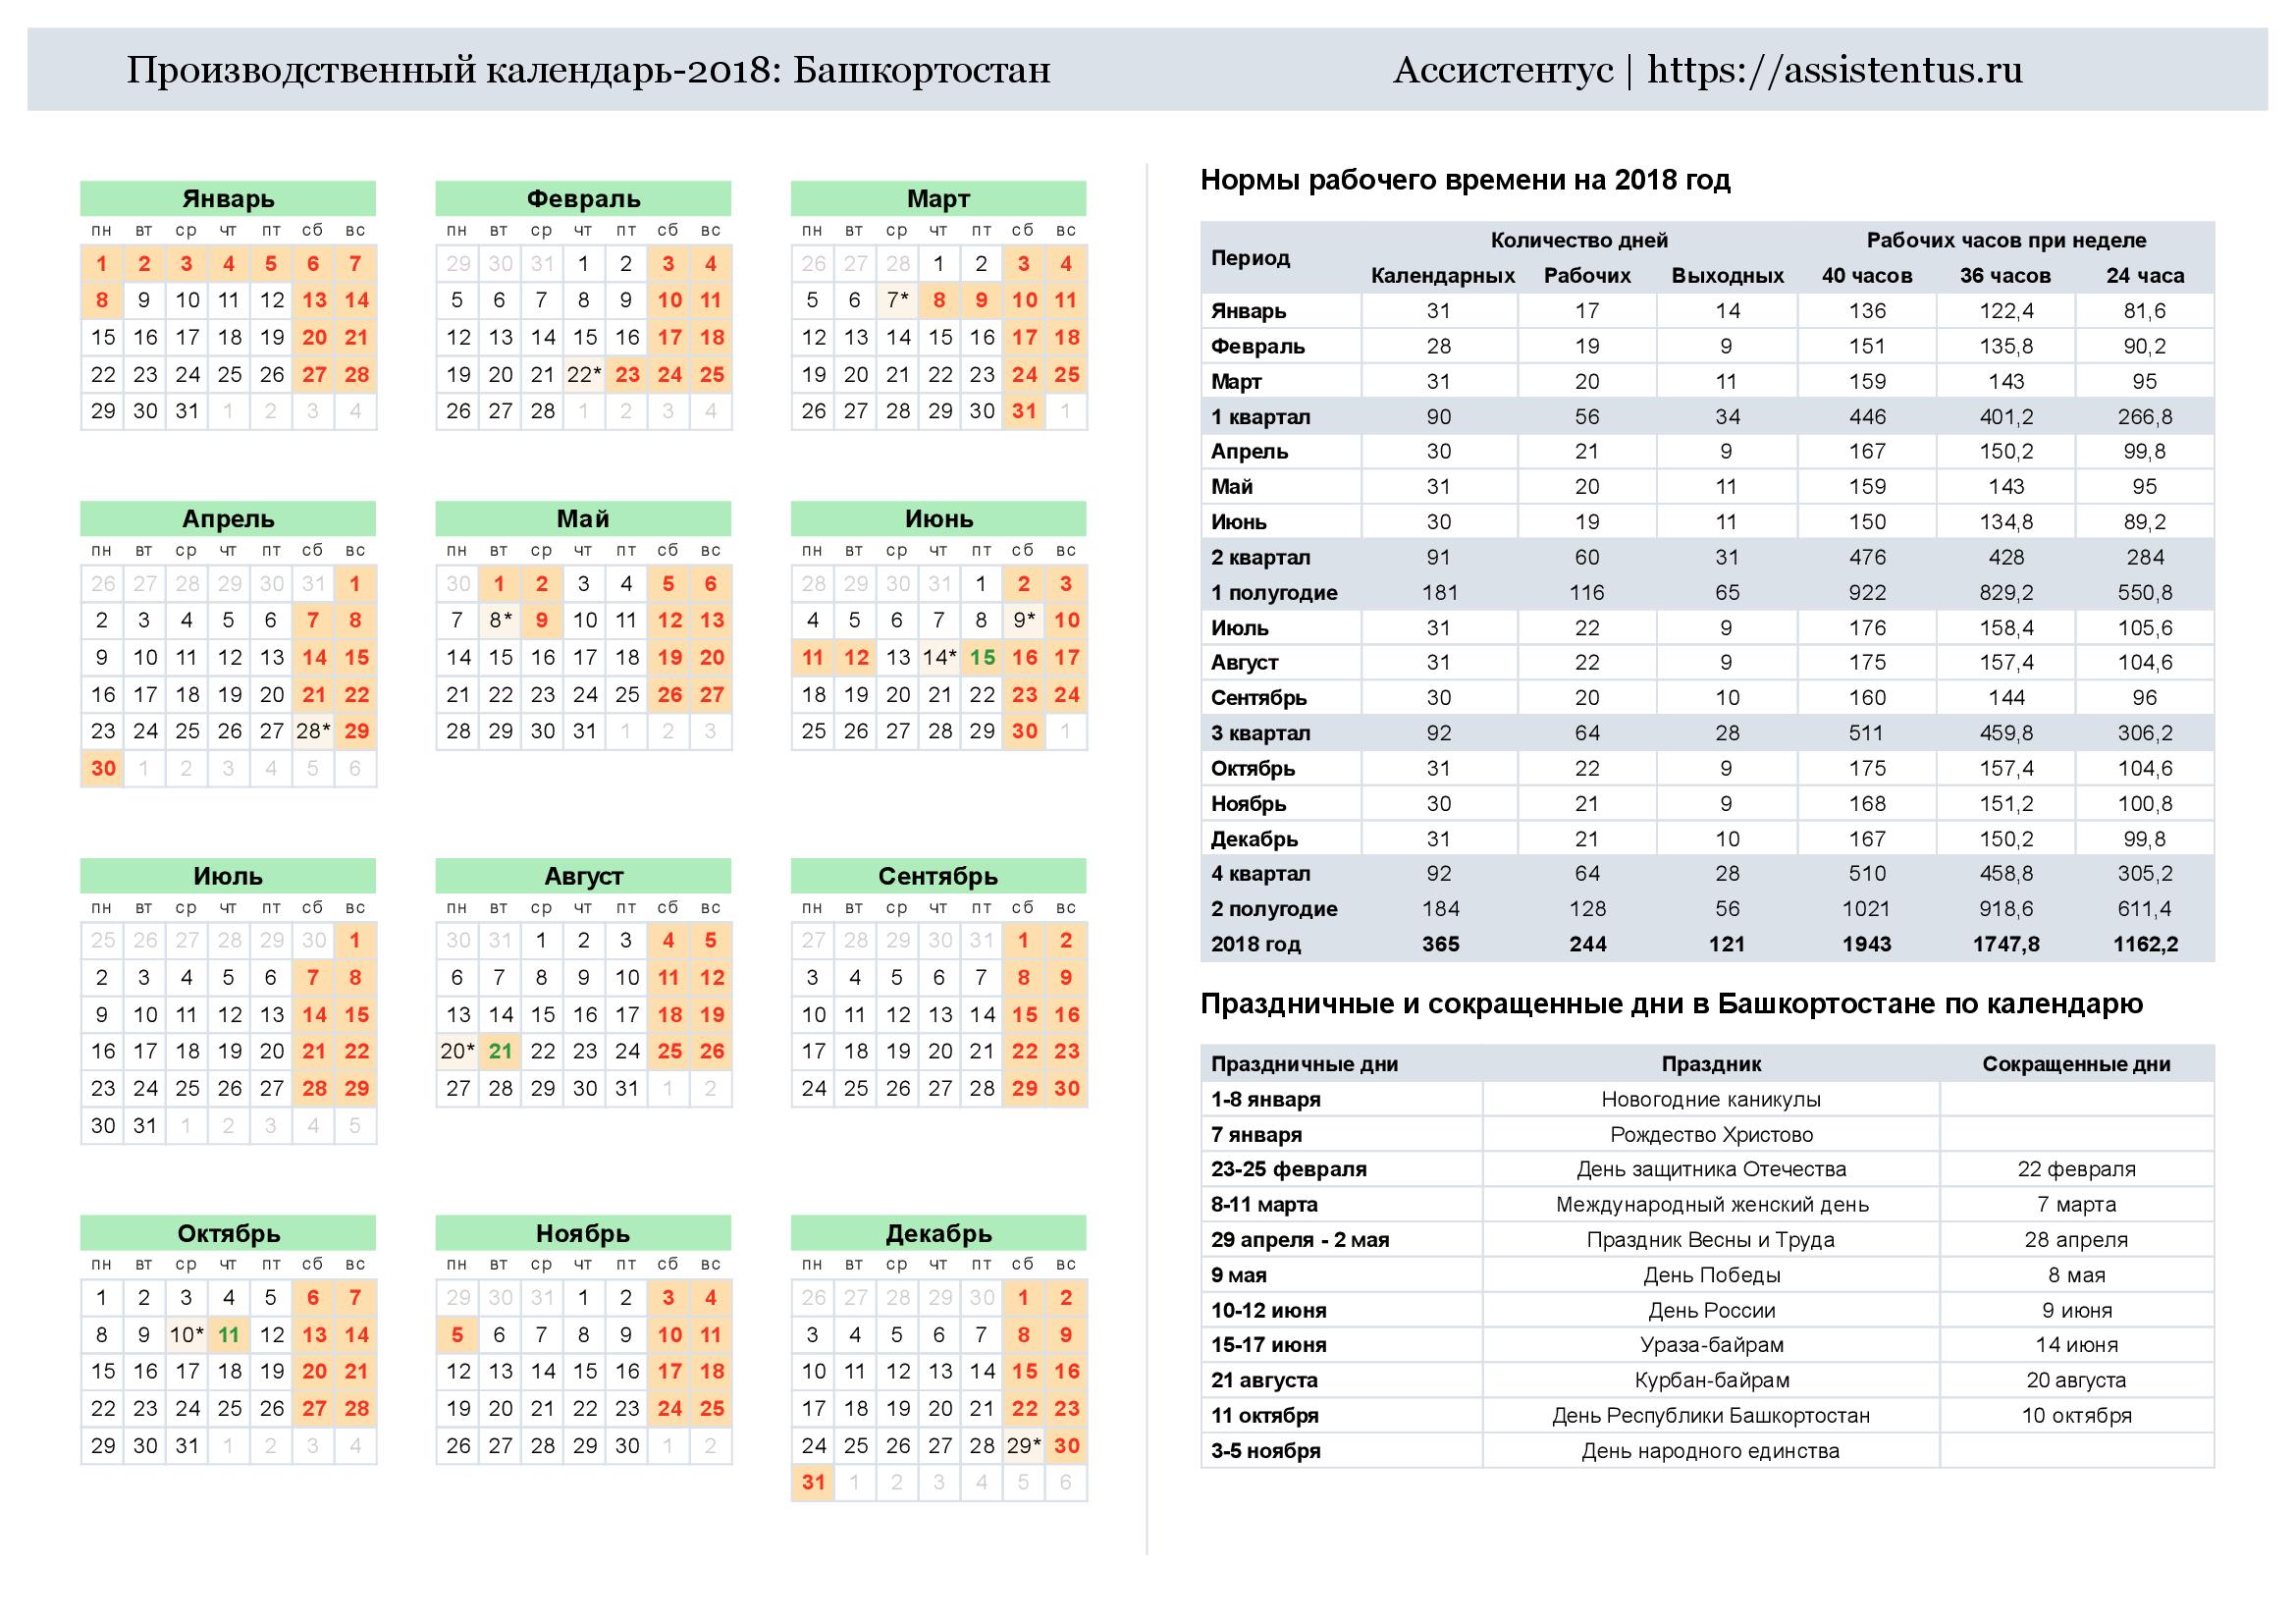 Производственный календарь 2018, Башкортостан